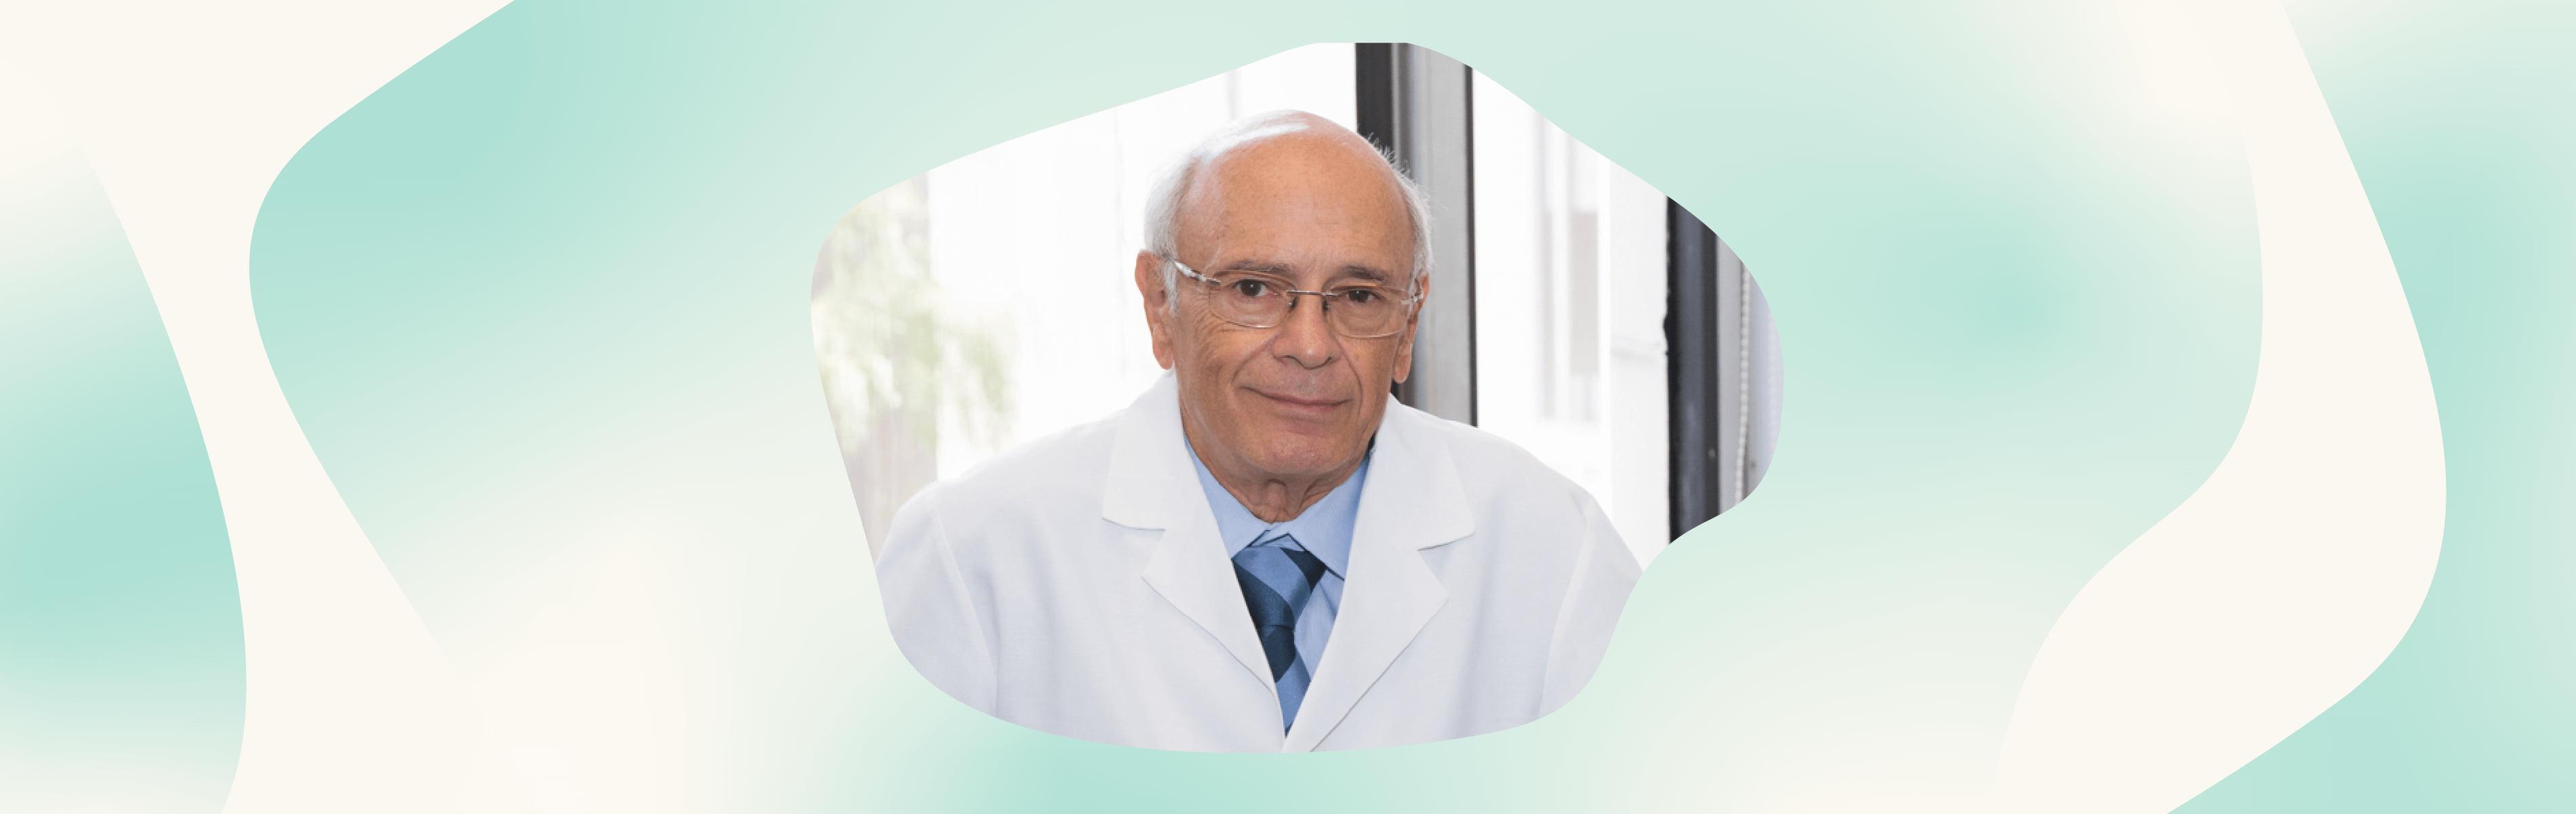 Part 2: Celiac Disease Q&A With Dr. Stefano Guandalini, MD